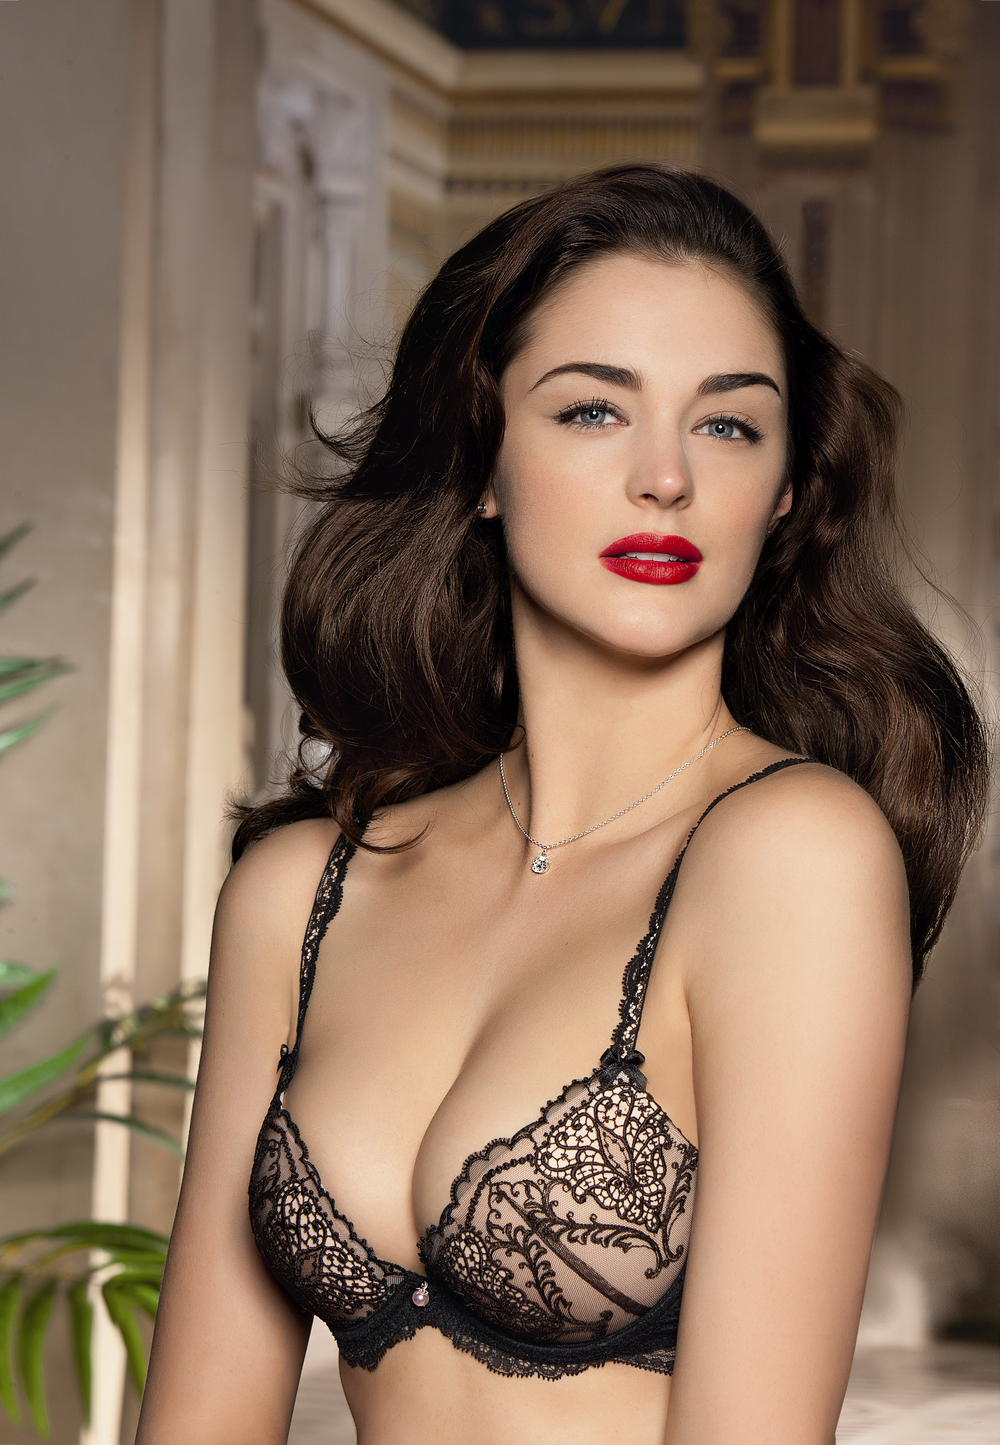 Elegante mujer madura sexy sofisticada